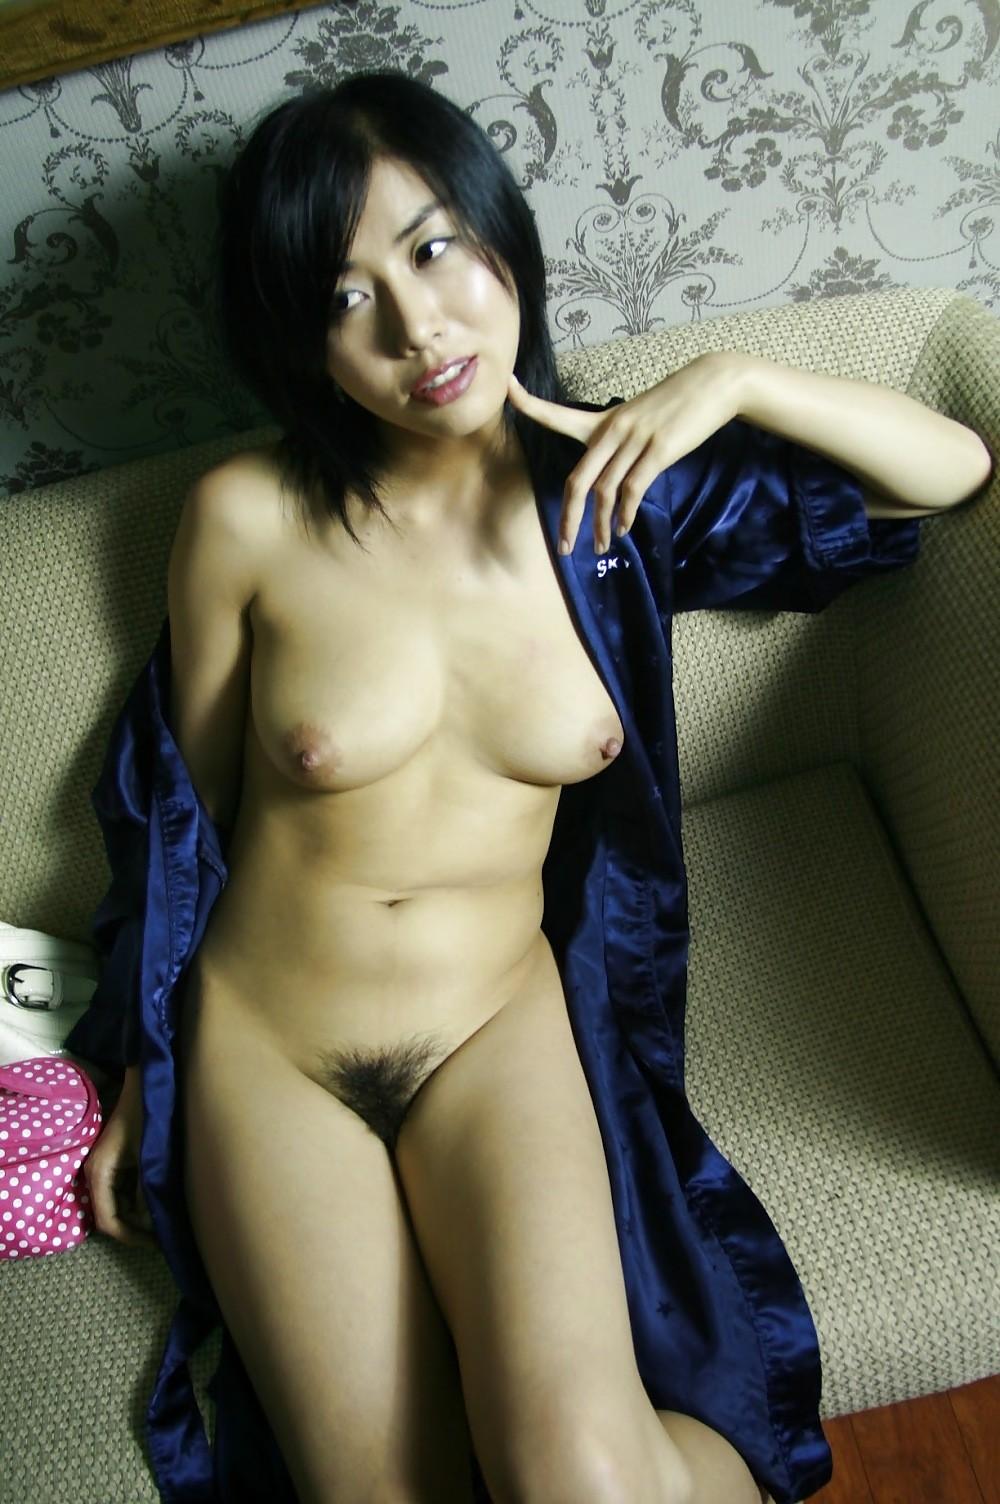 Asian Uncensored Tube ikkitousen uncensored - megapornx